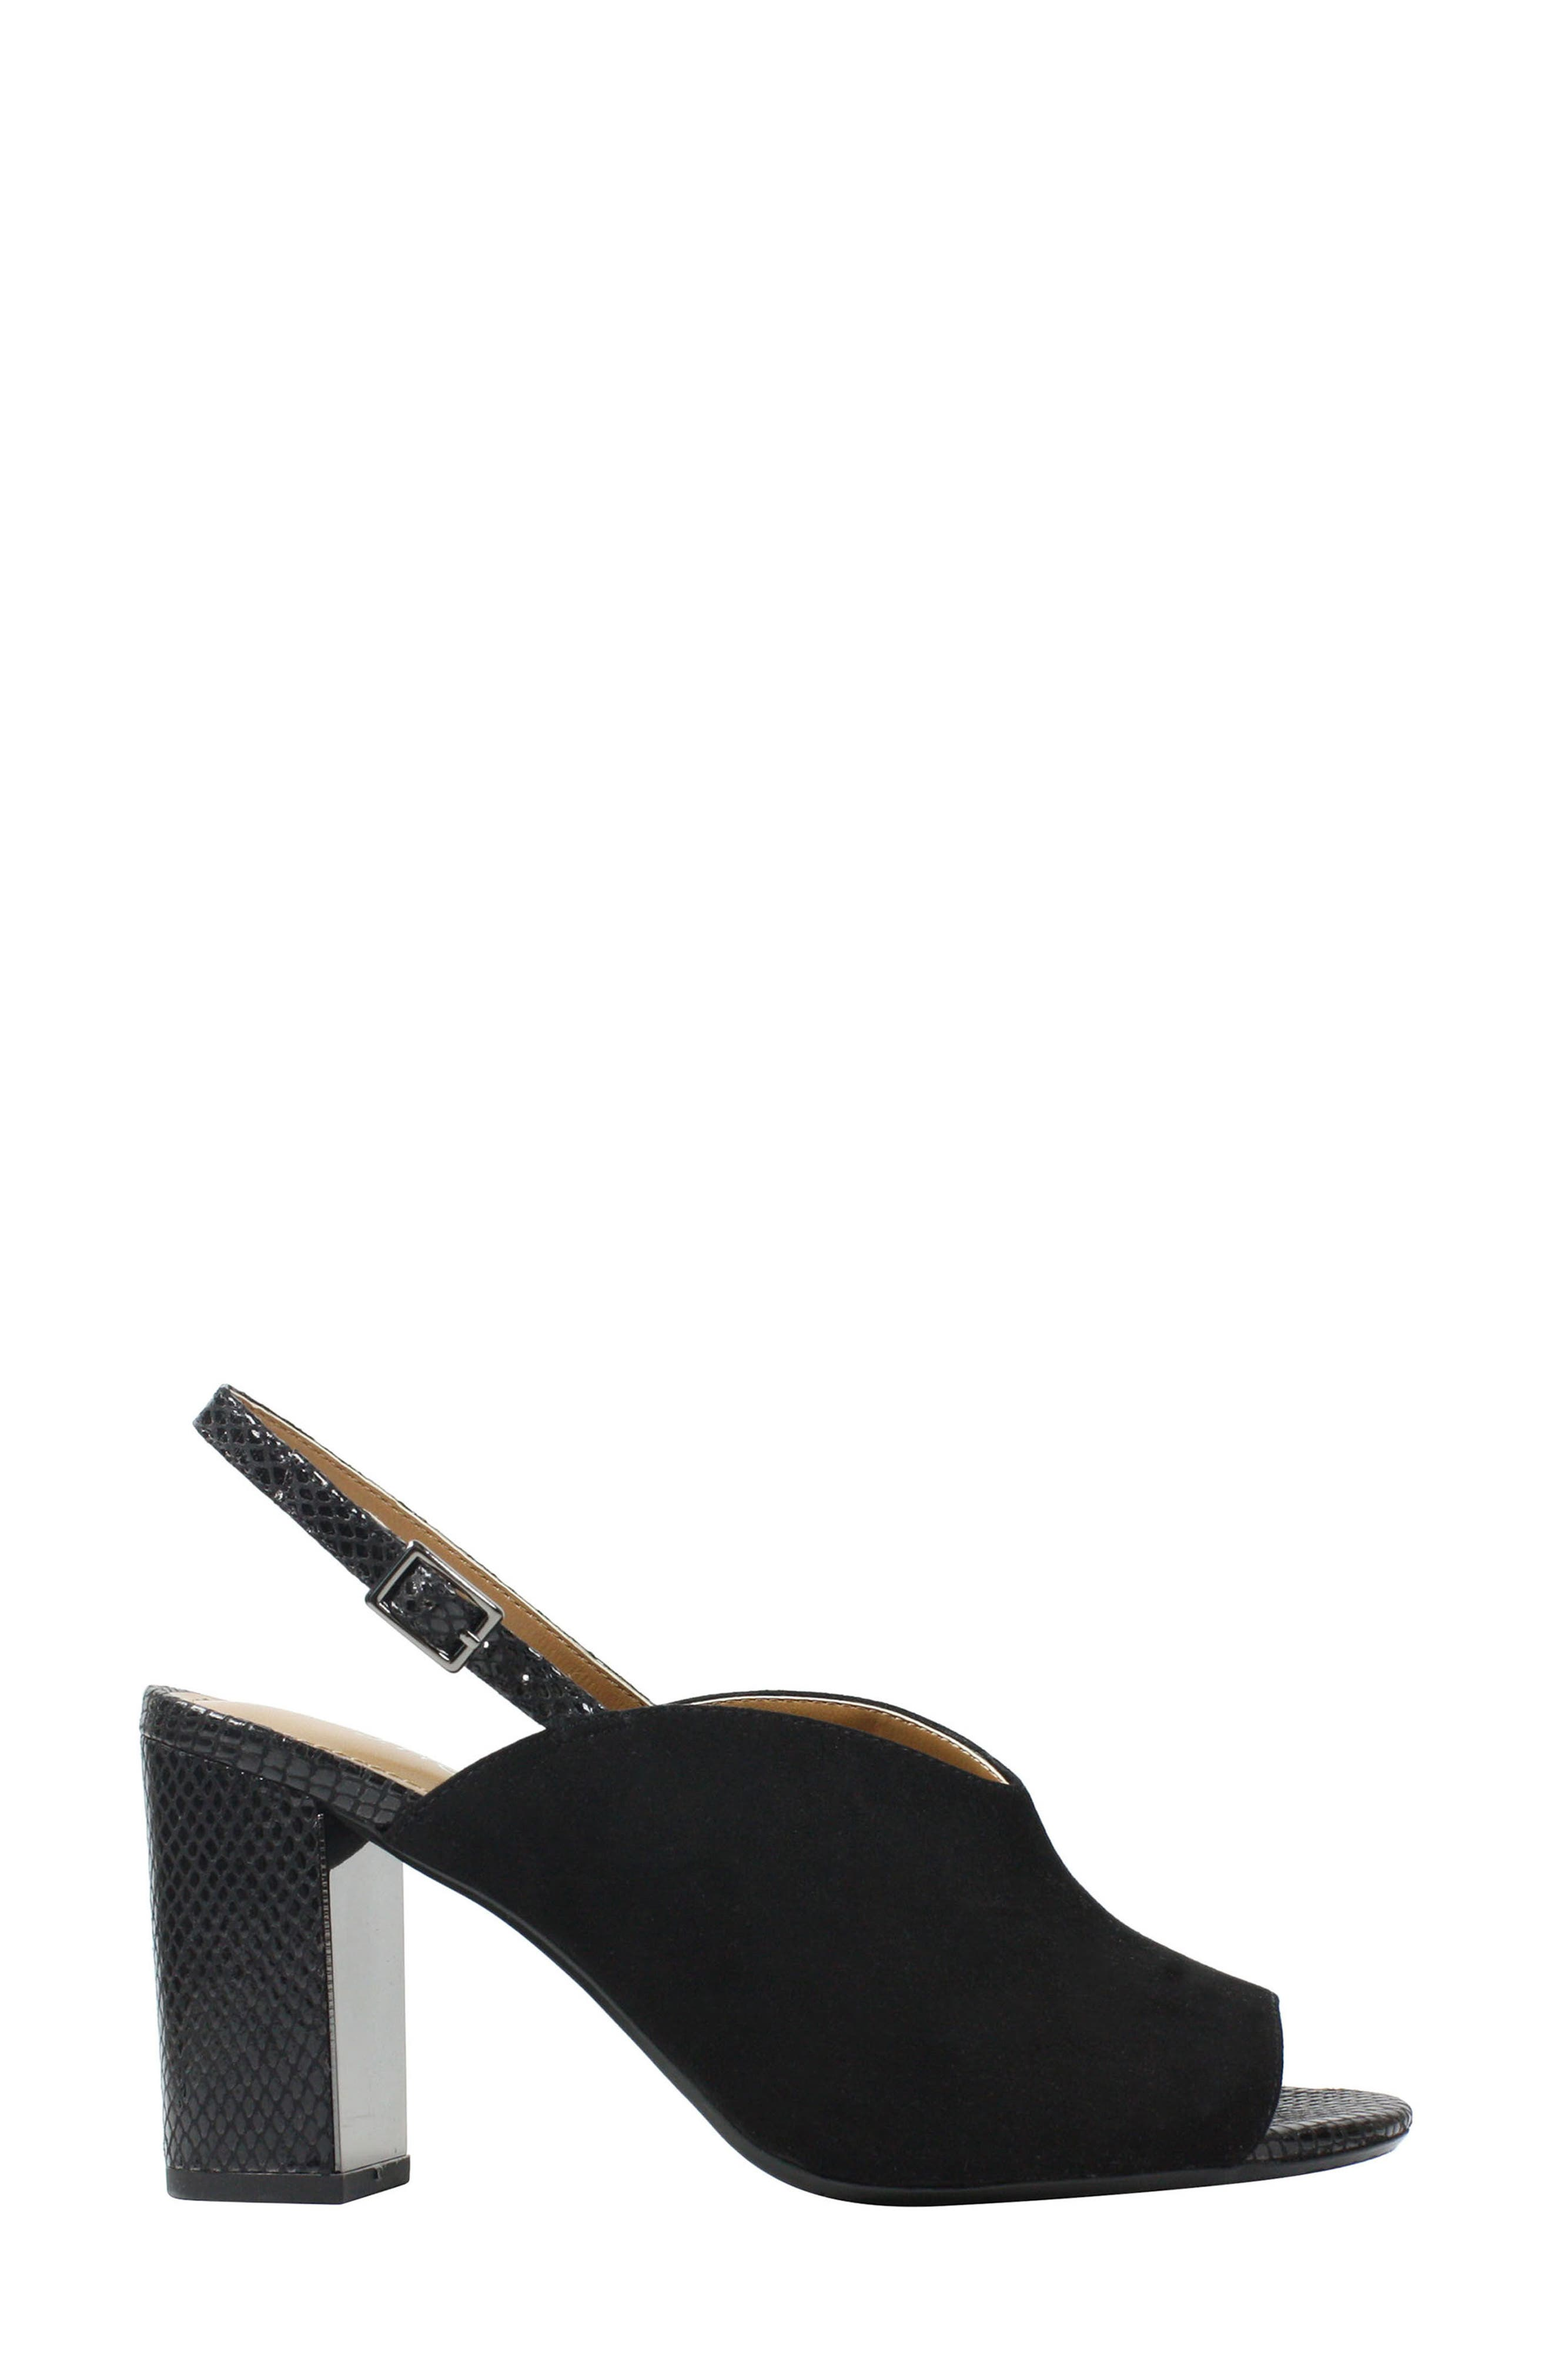 Maarya Block Heel Sandal,                             Alternate thumbnail 2, color,                             001